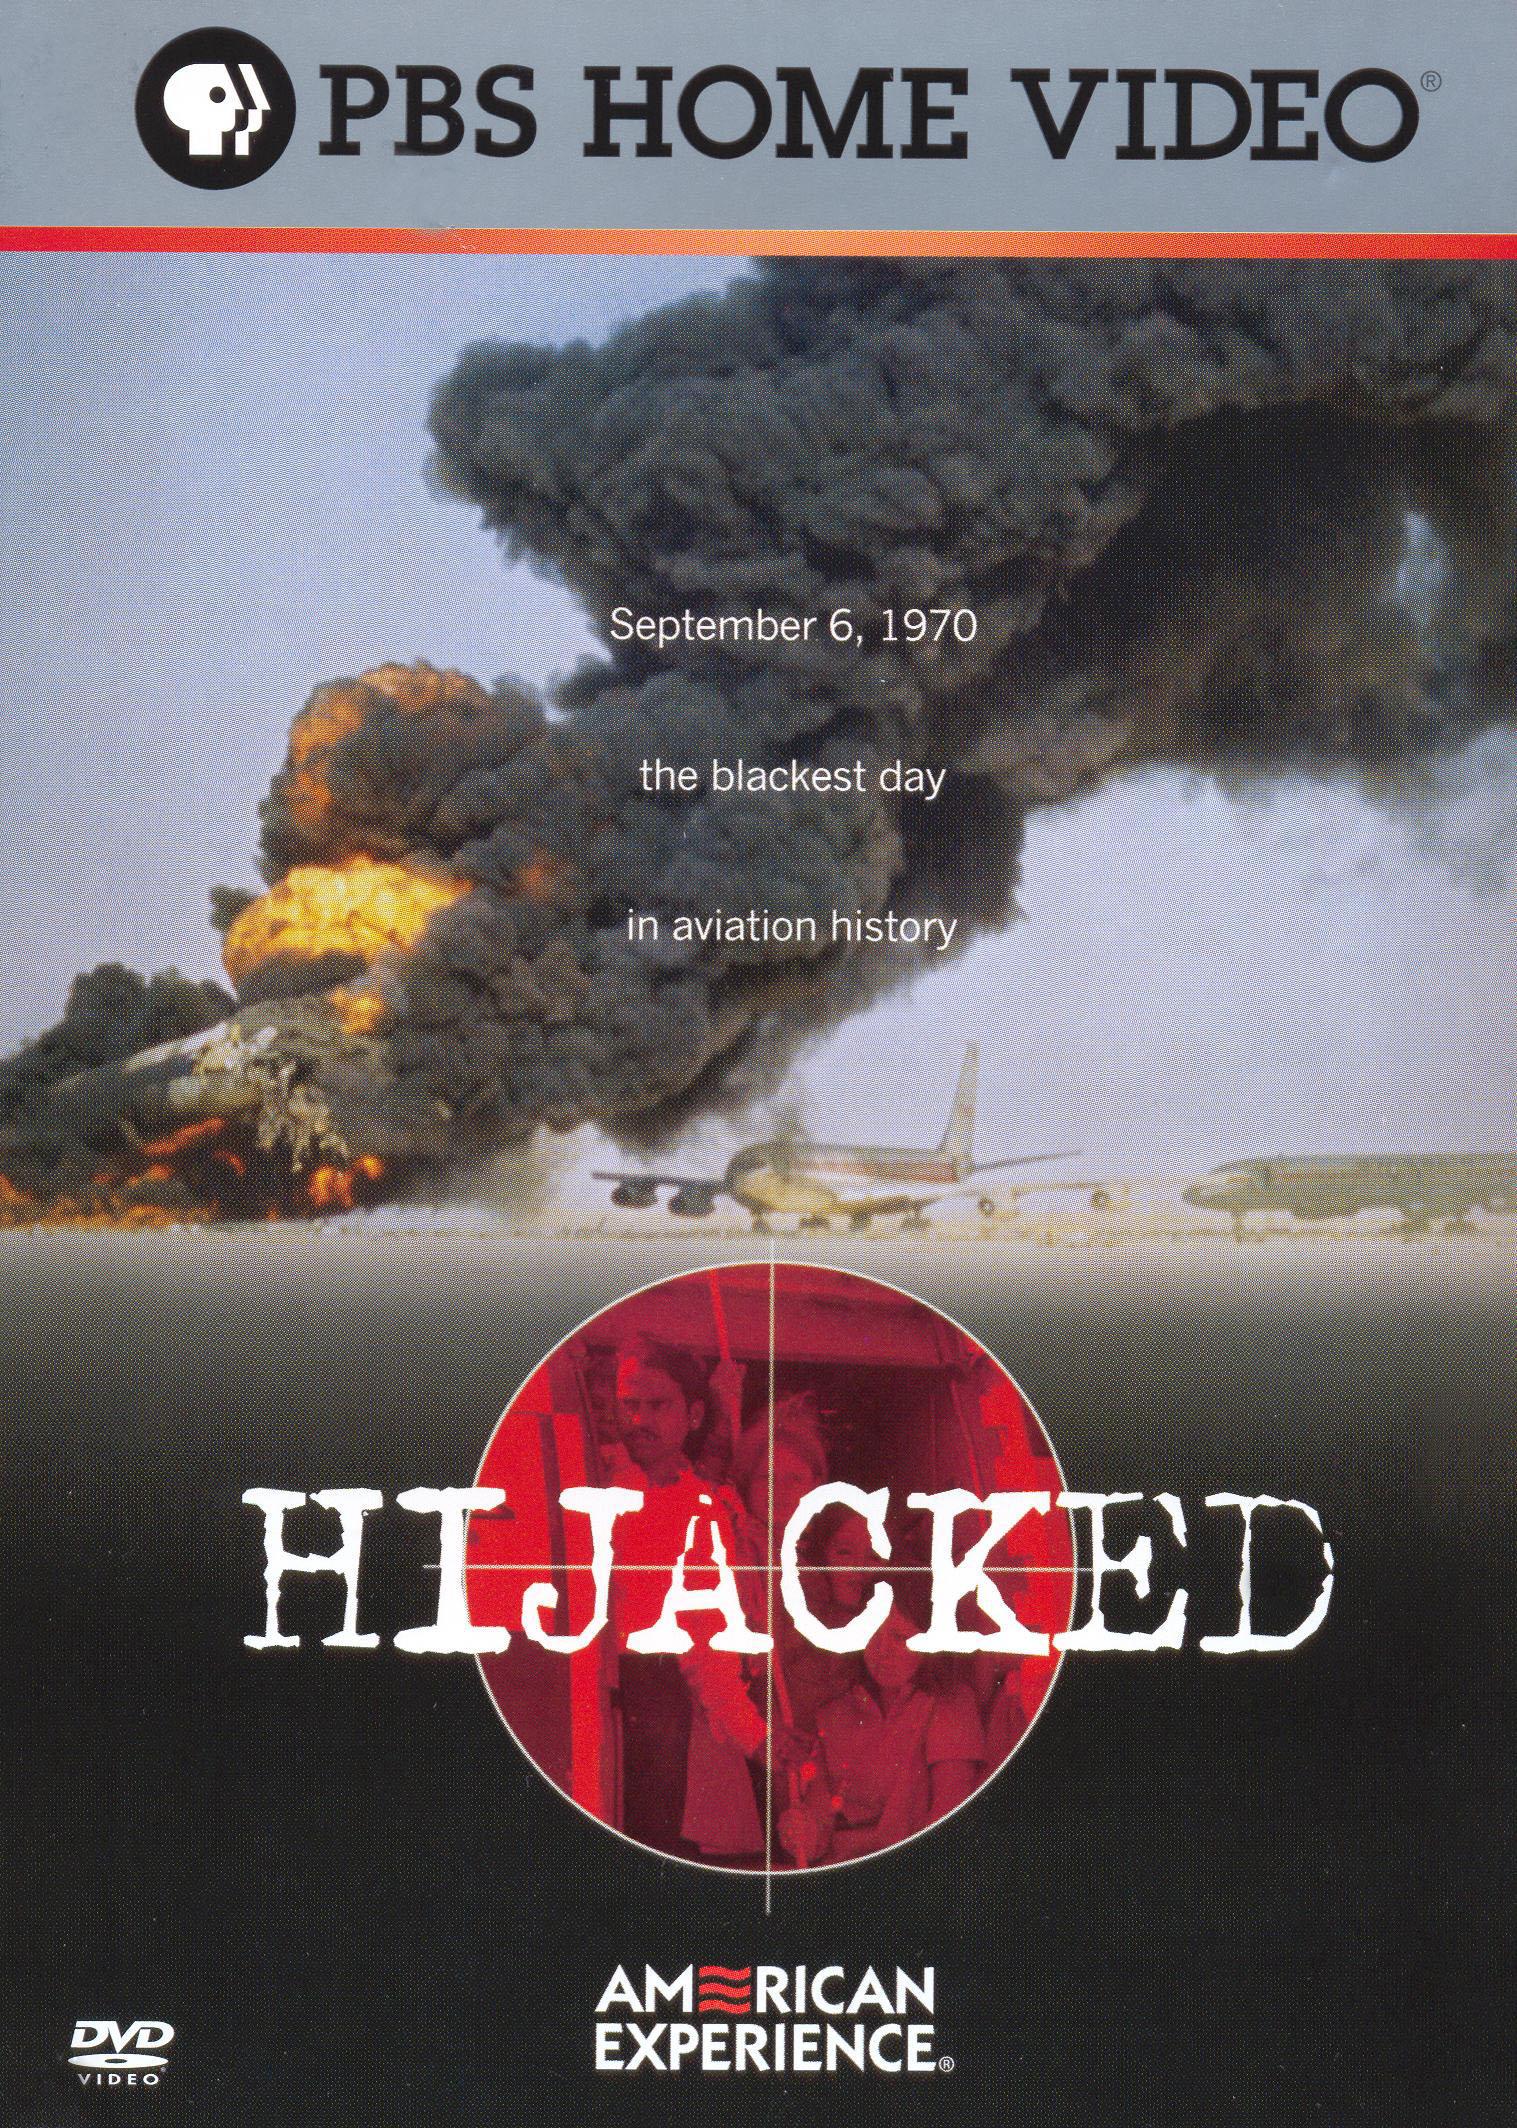 American Experience: Hijacked